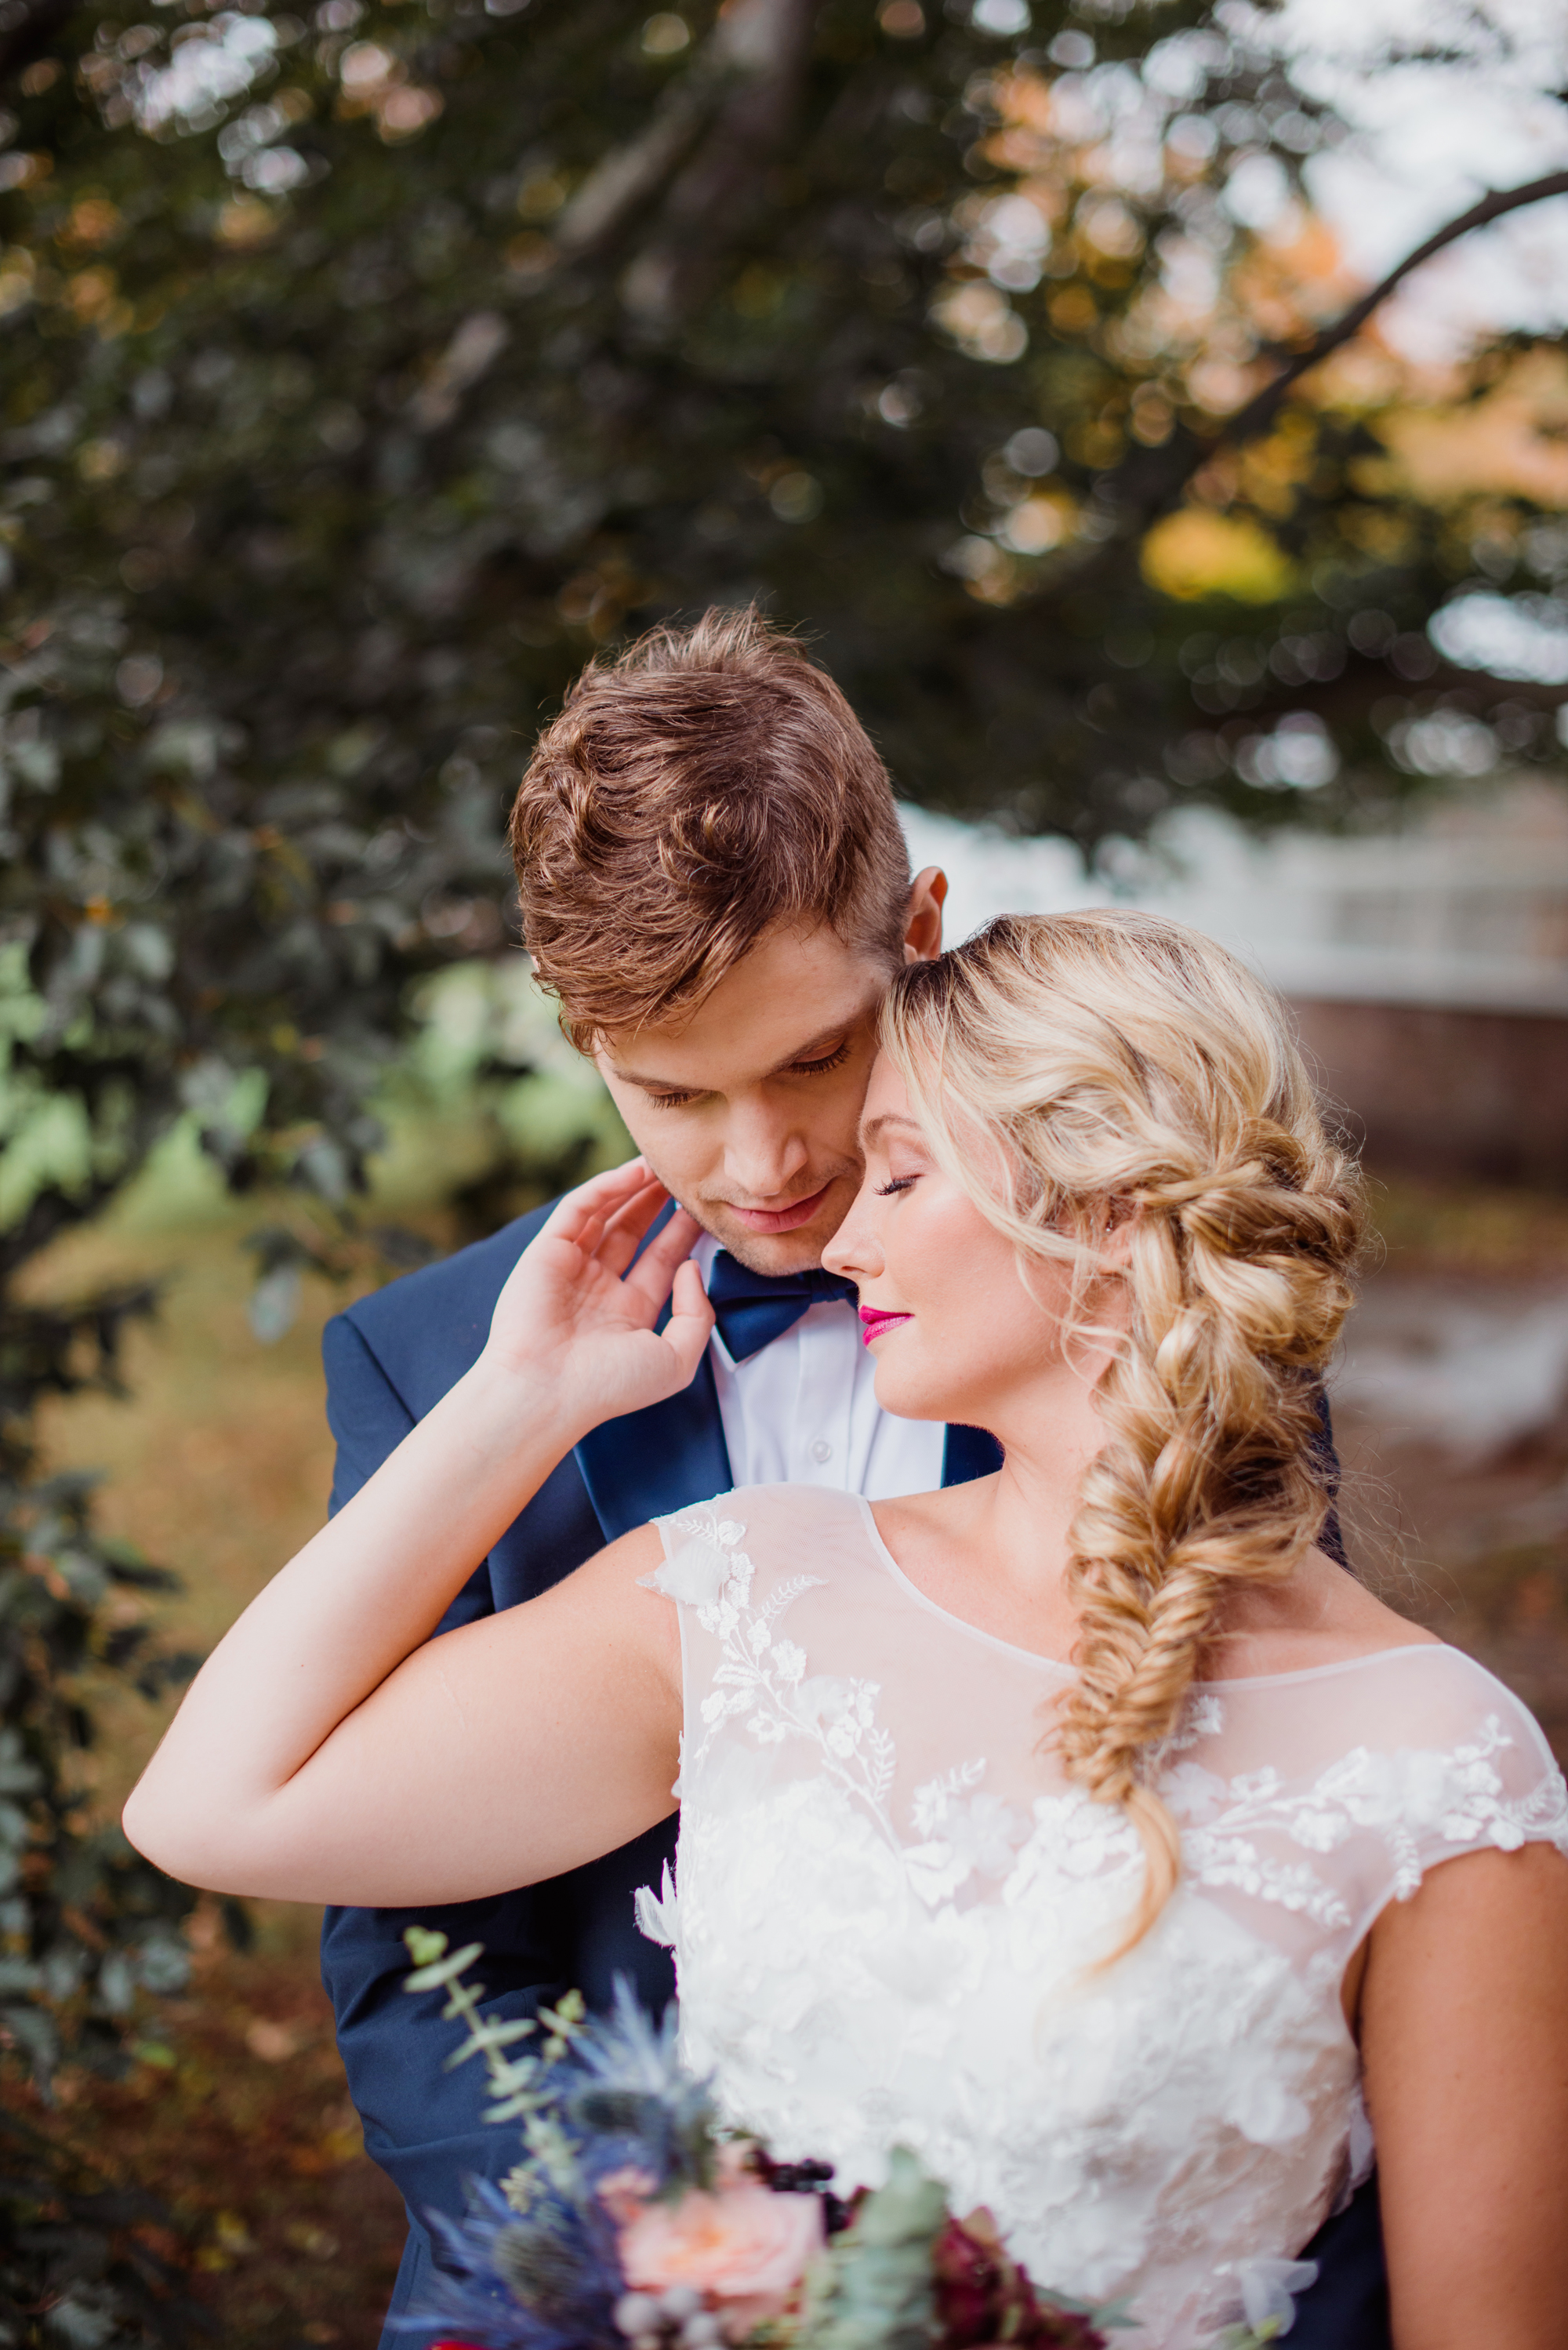 outdoor wedding photography inspiration couple wedding photo pose